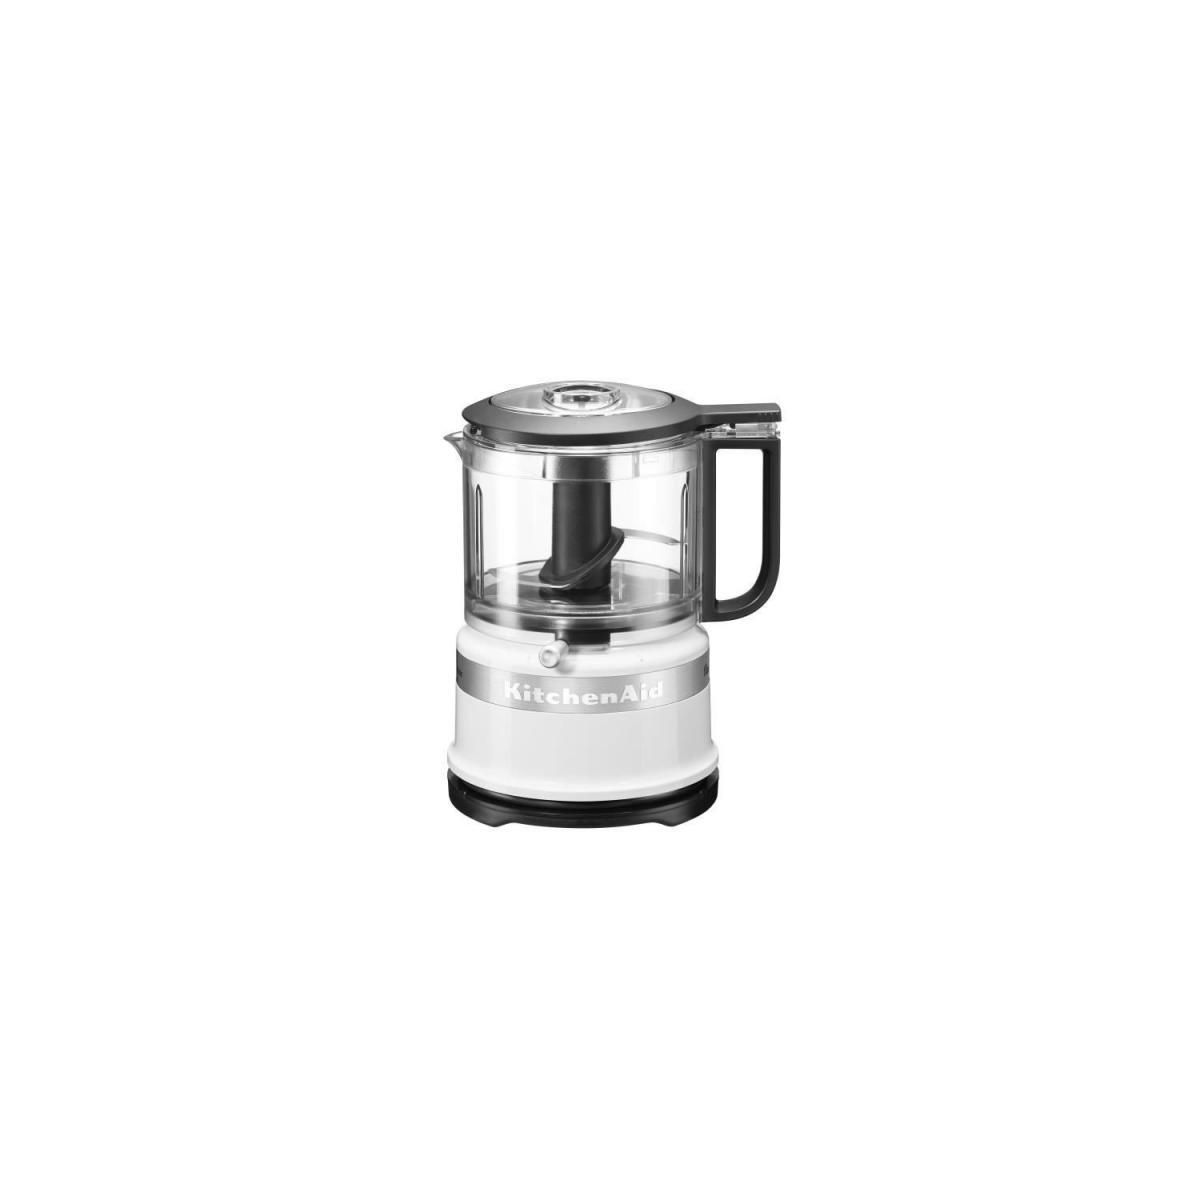 Kitchenaid KITCHENAID 5KFC3516EWH Mini hachoir - Blanc